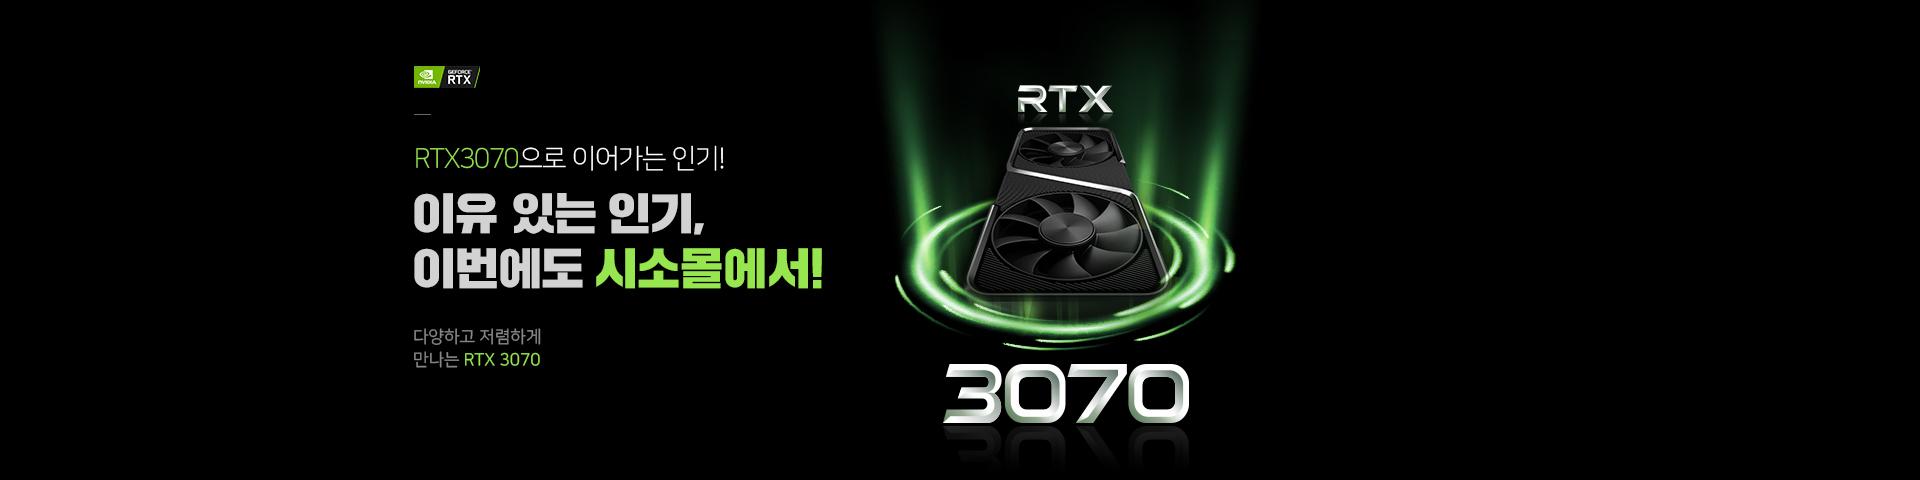 [nvidia]RTX3070모음 기획전